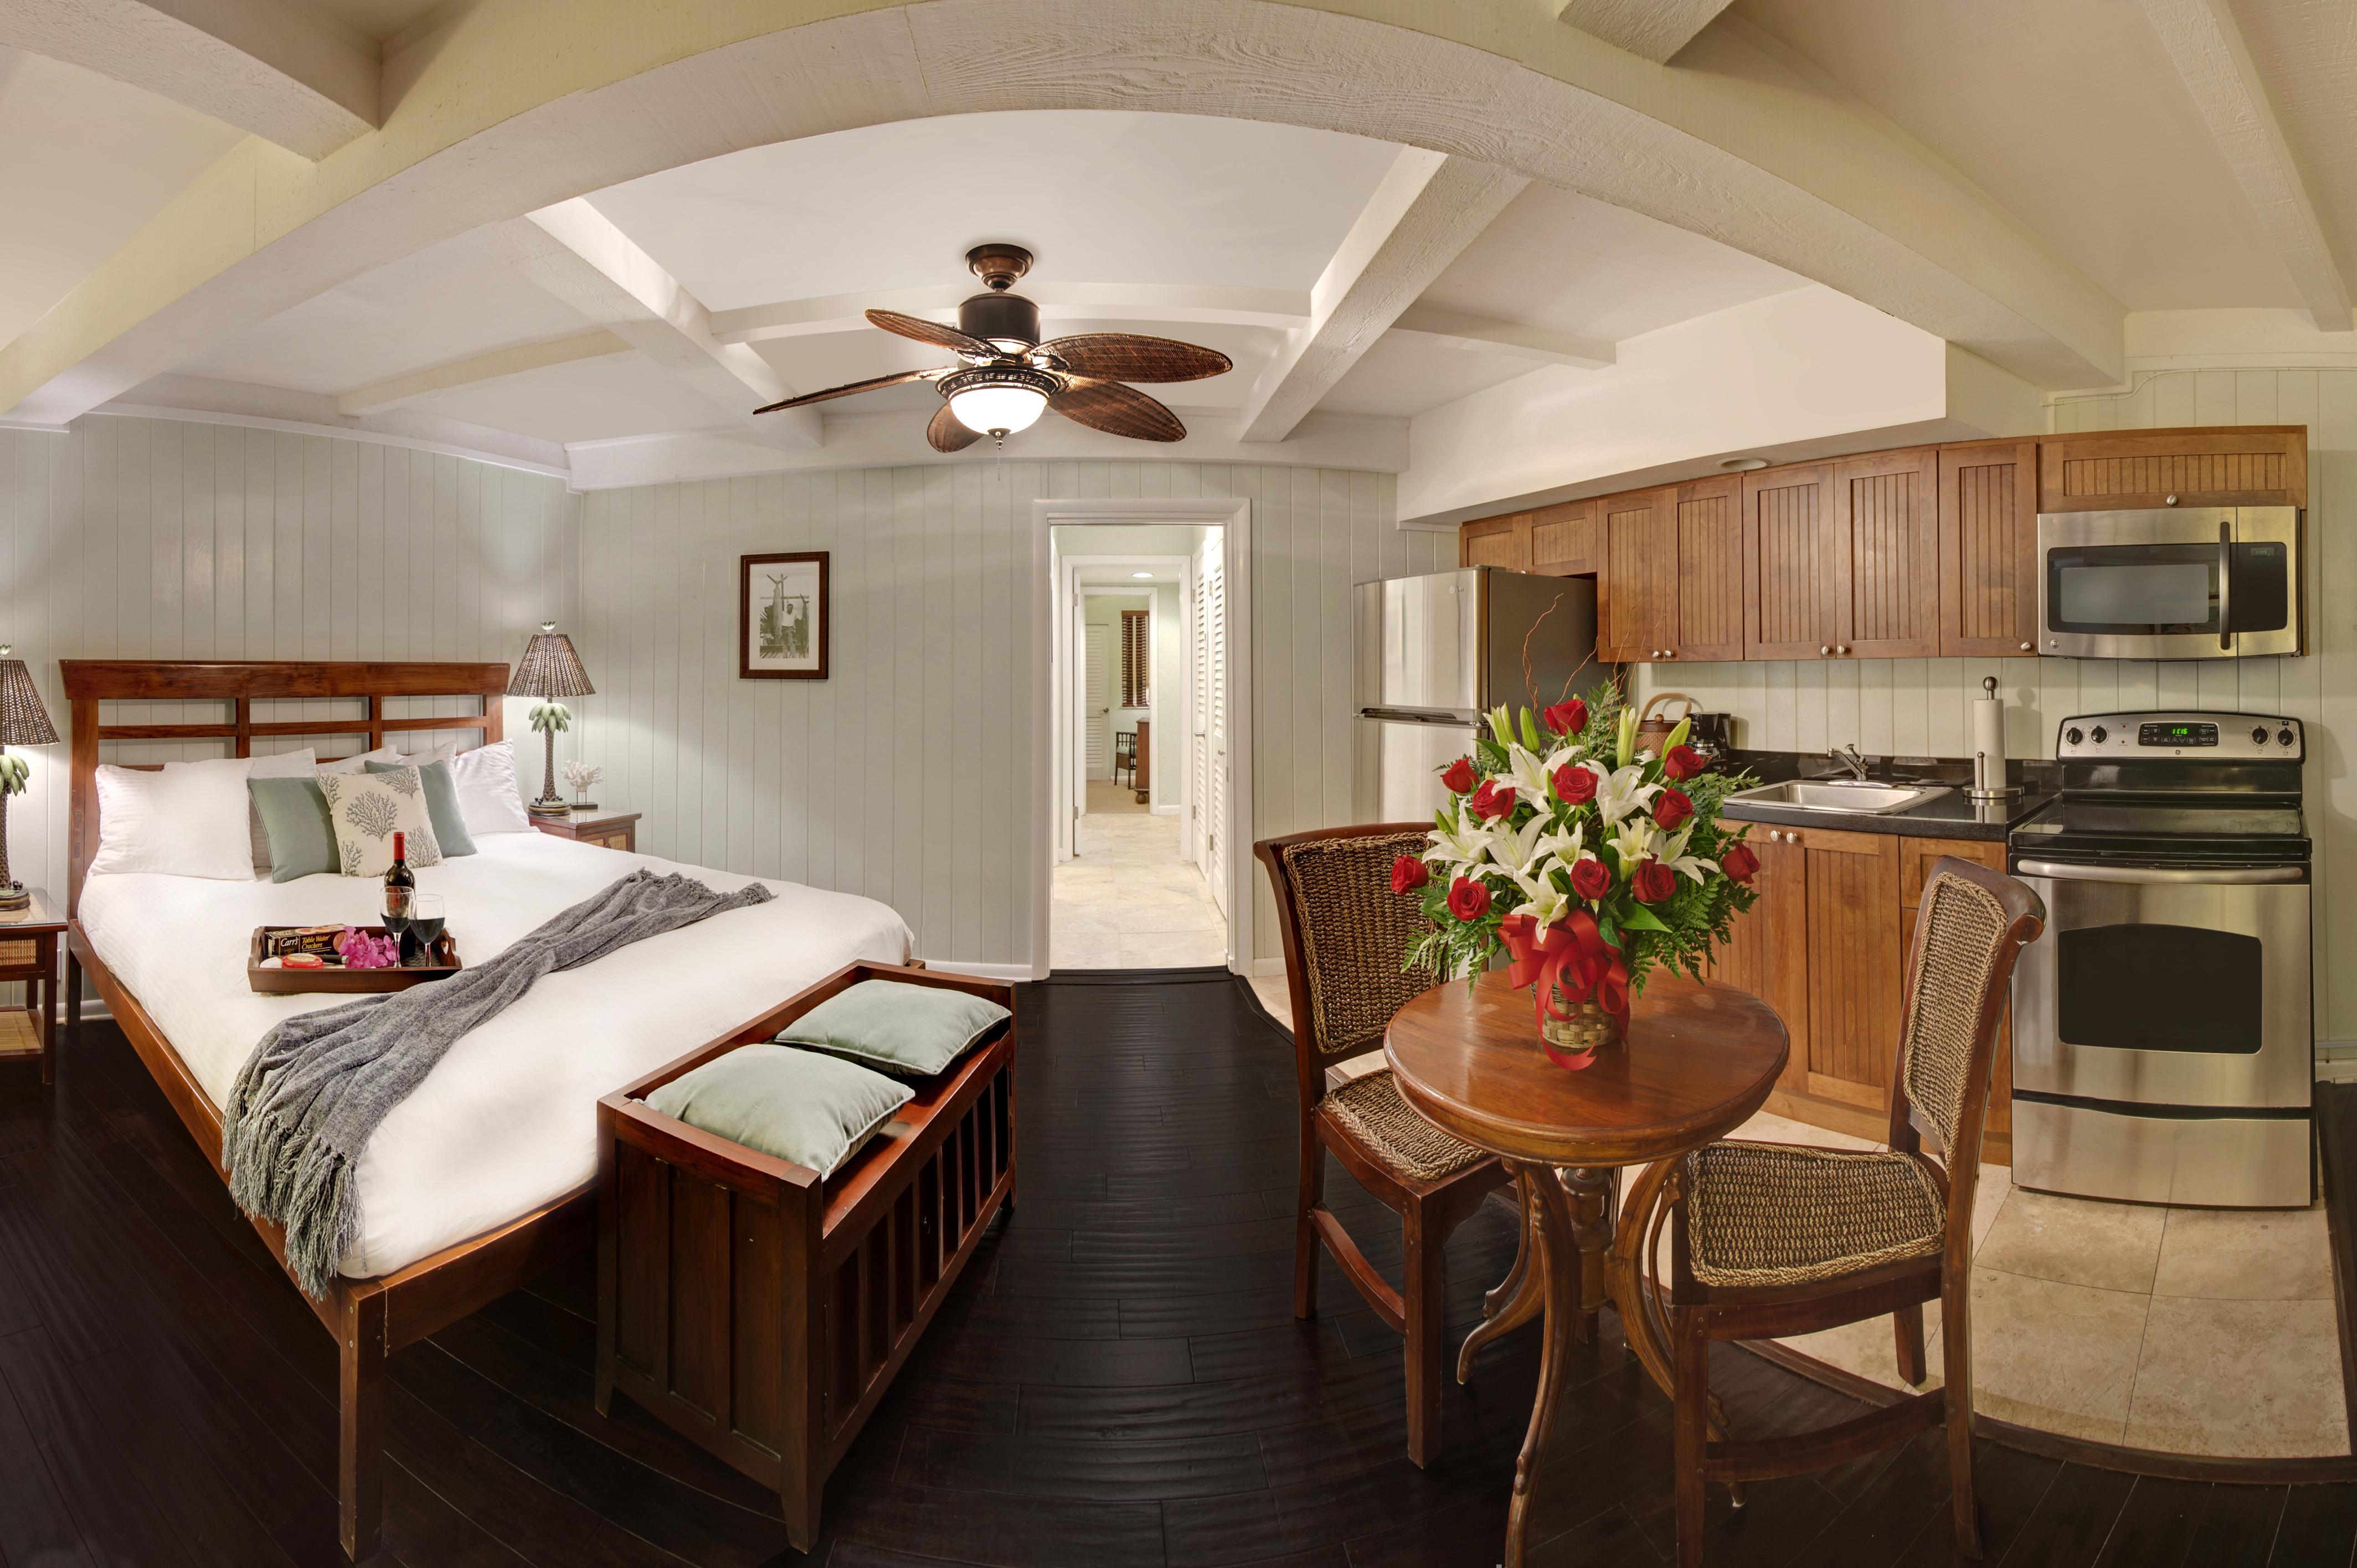 Coconut Palm Inn, Tavernier FL